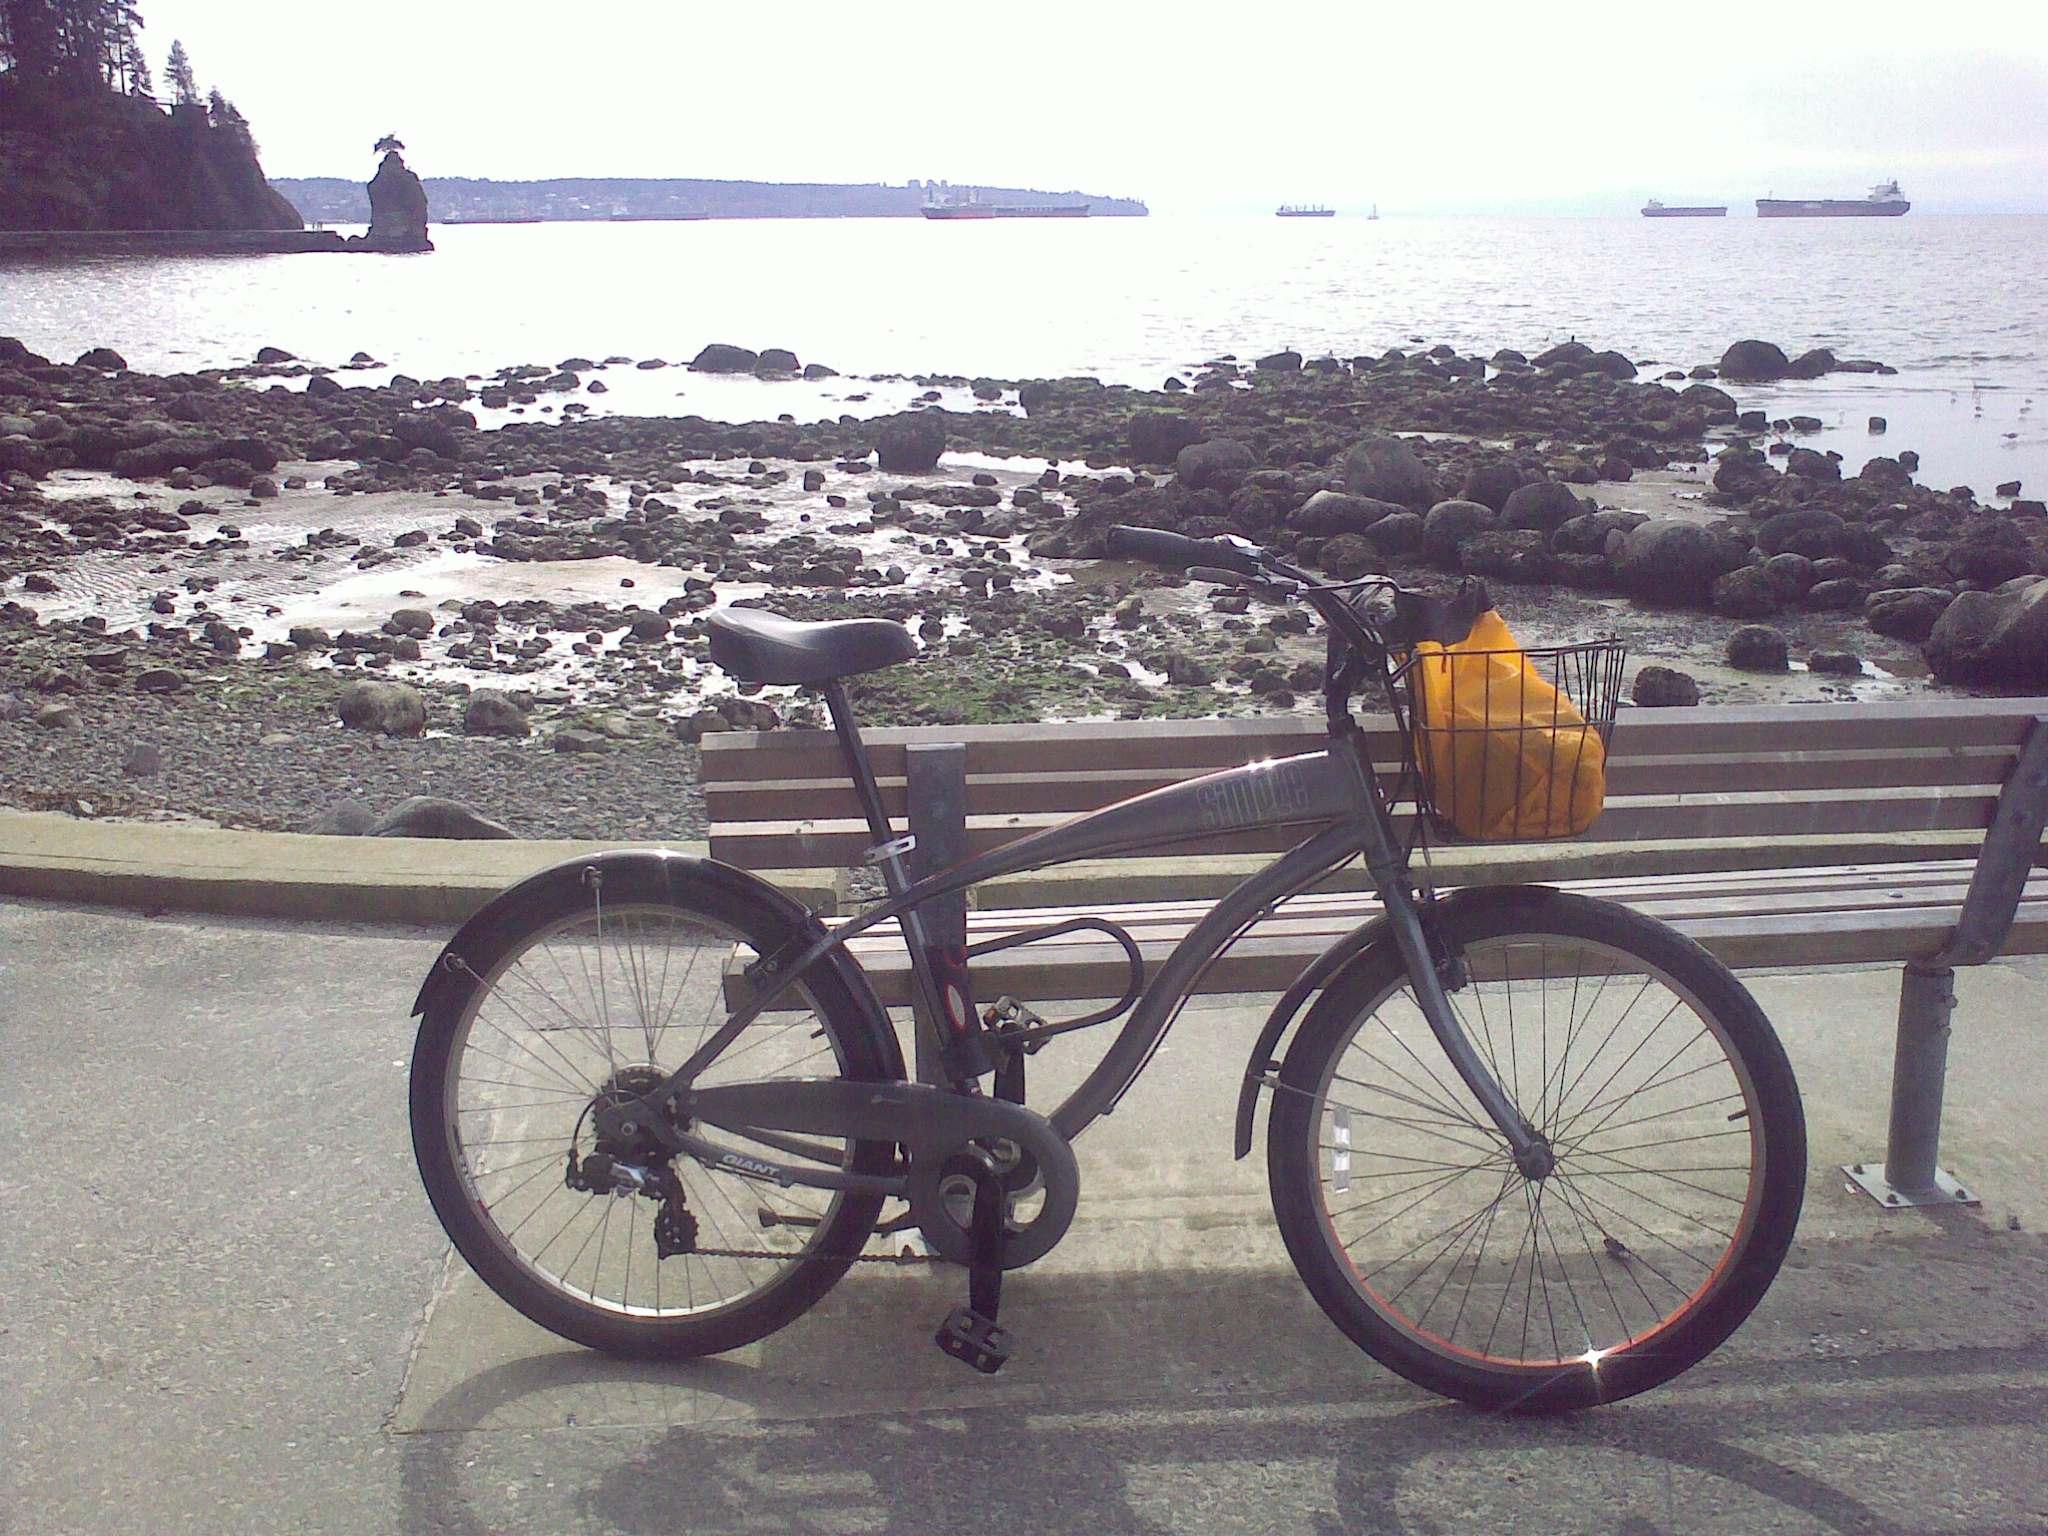 image from Biking through Stanley Park